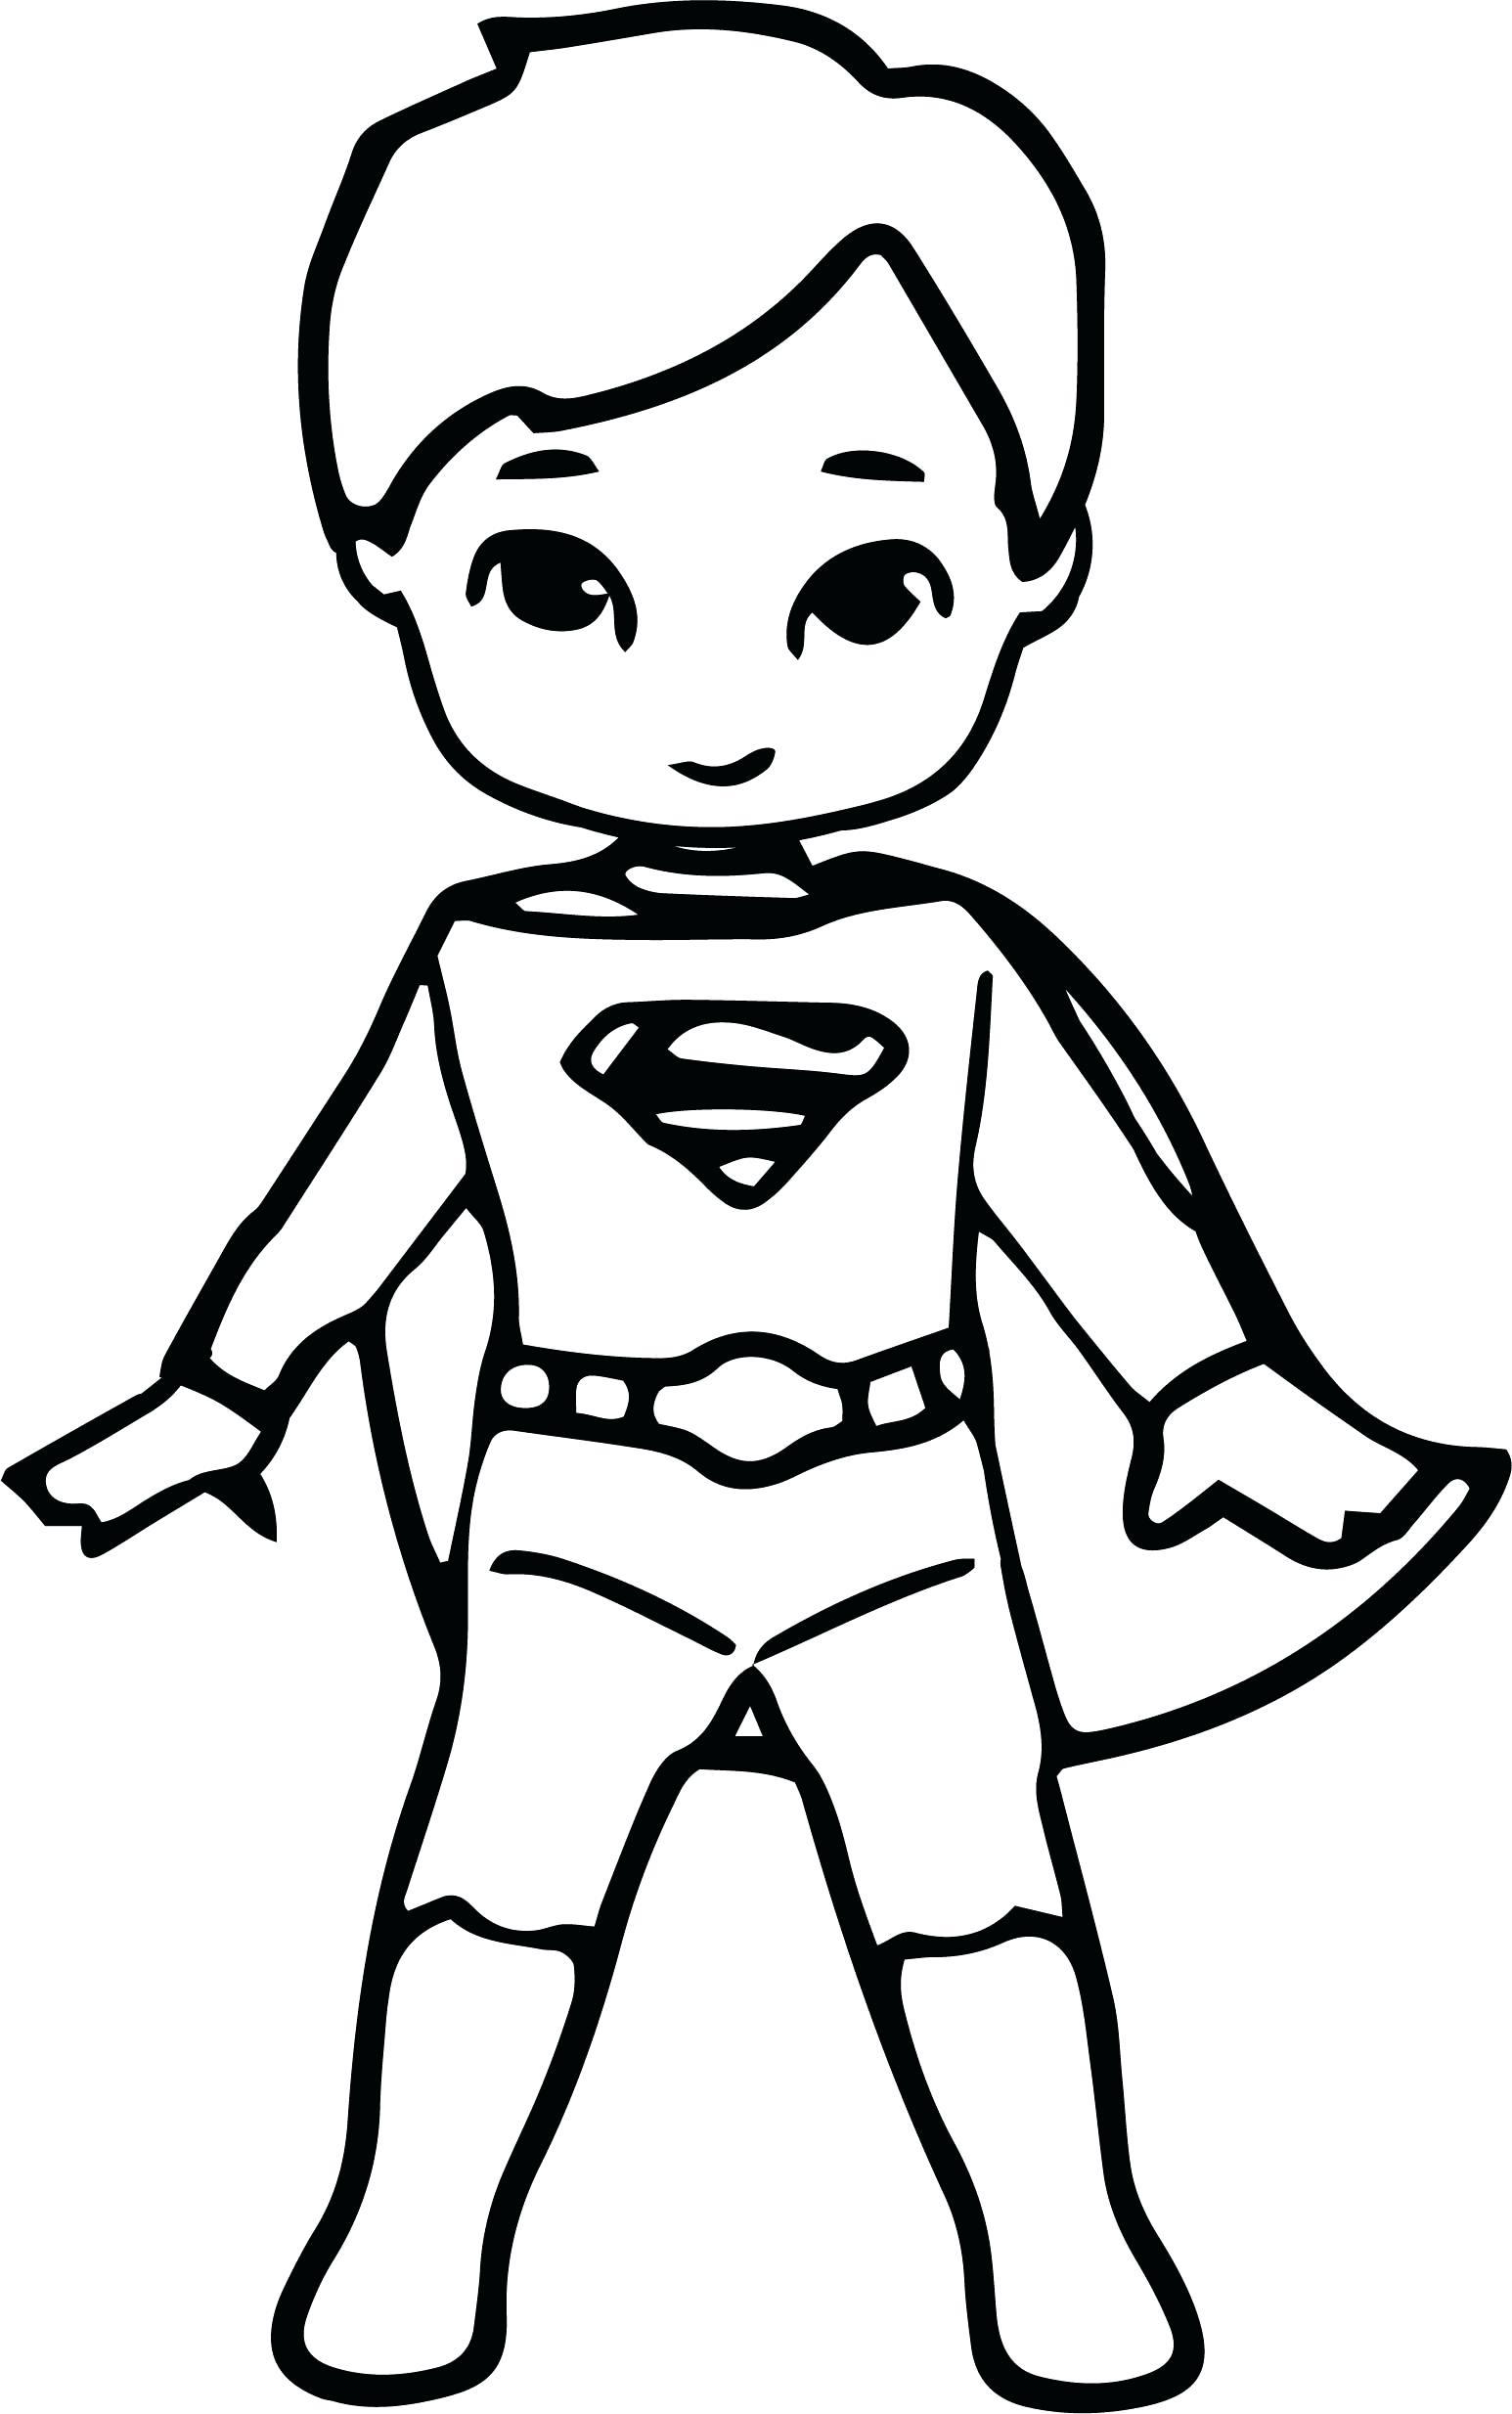 Kid Superhero Drawing At Getdrawings